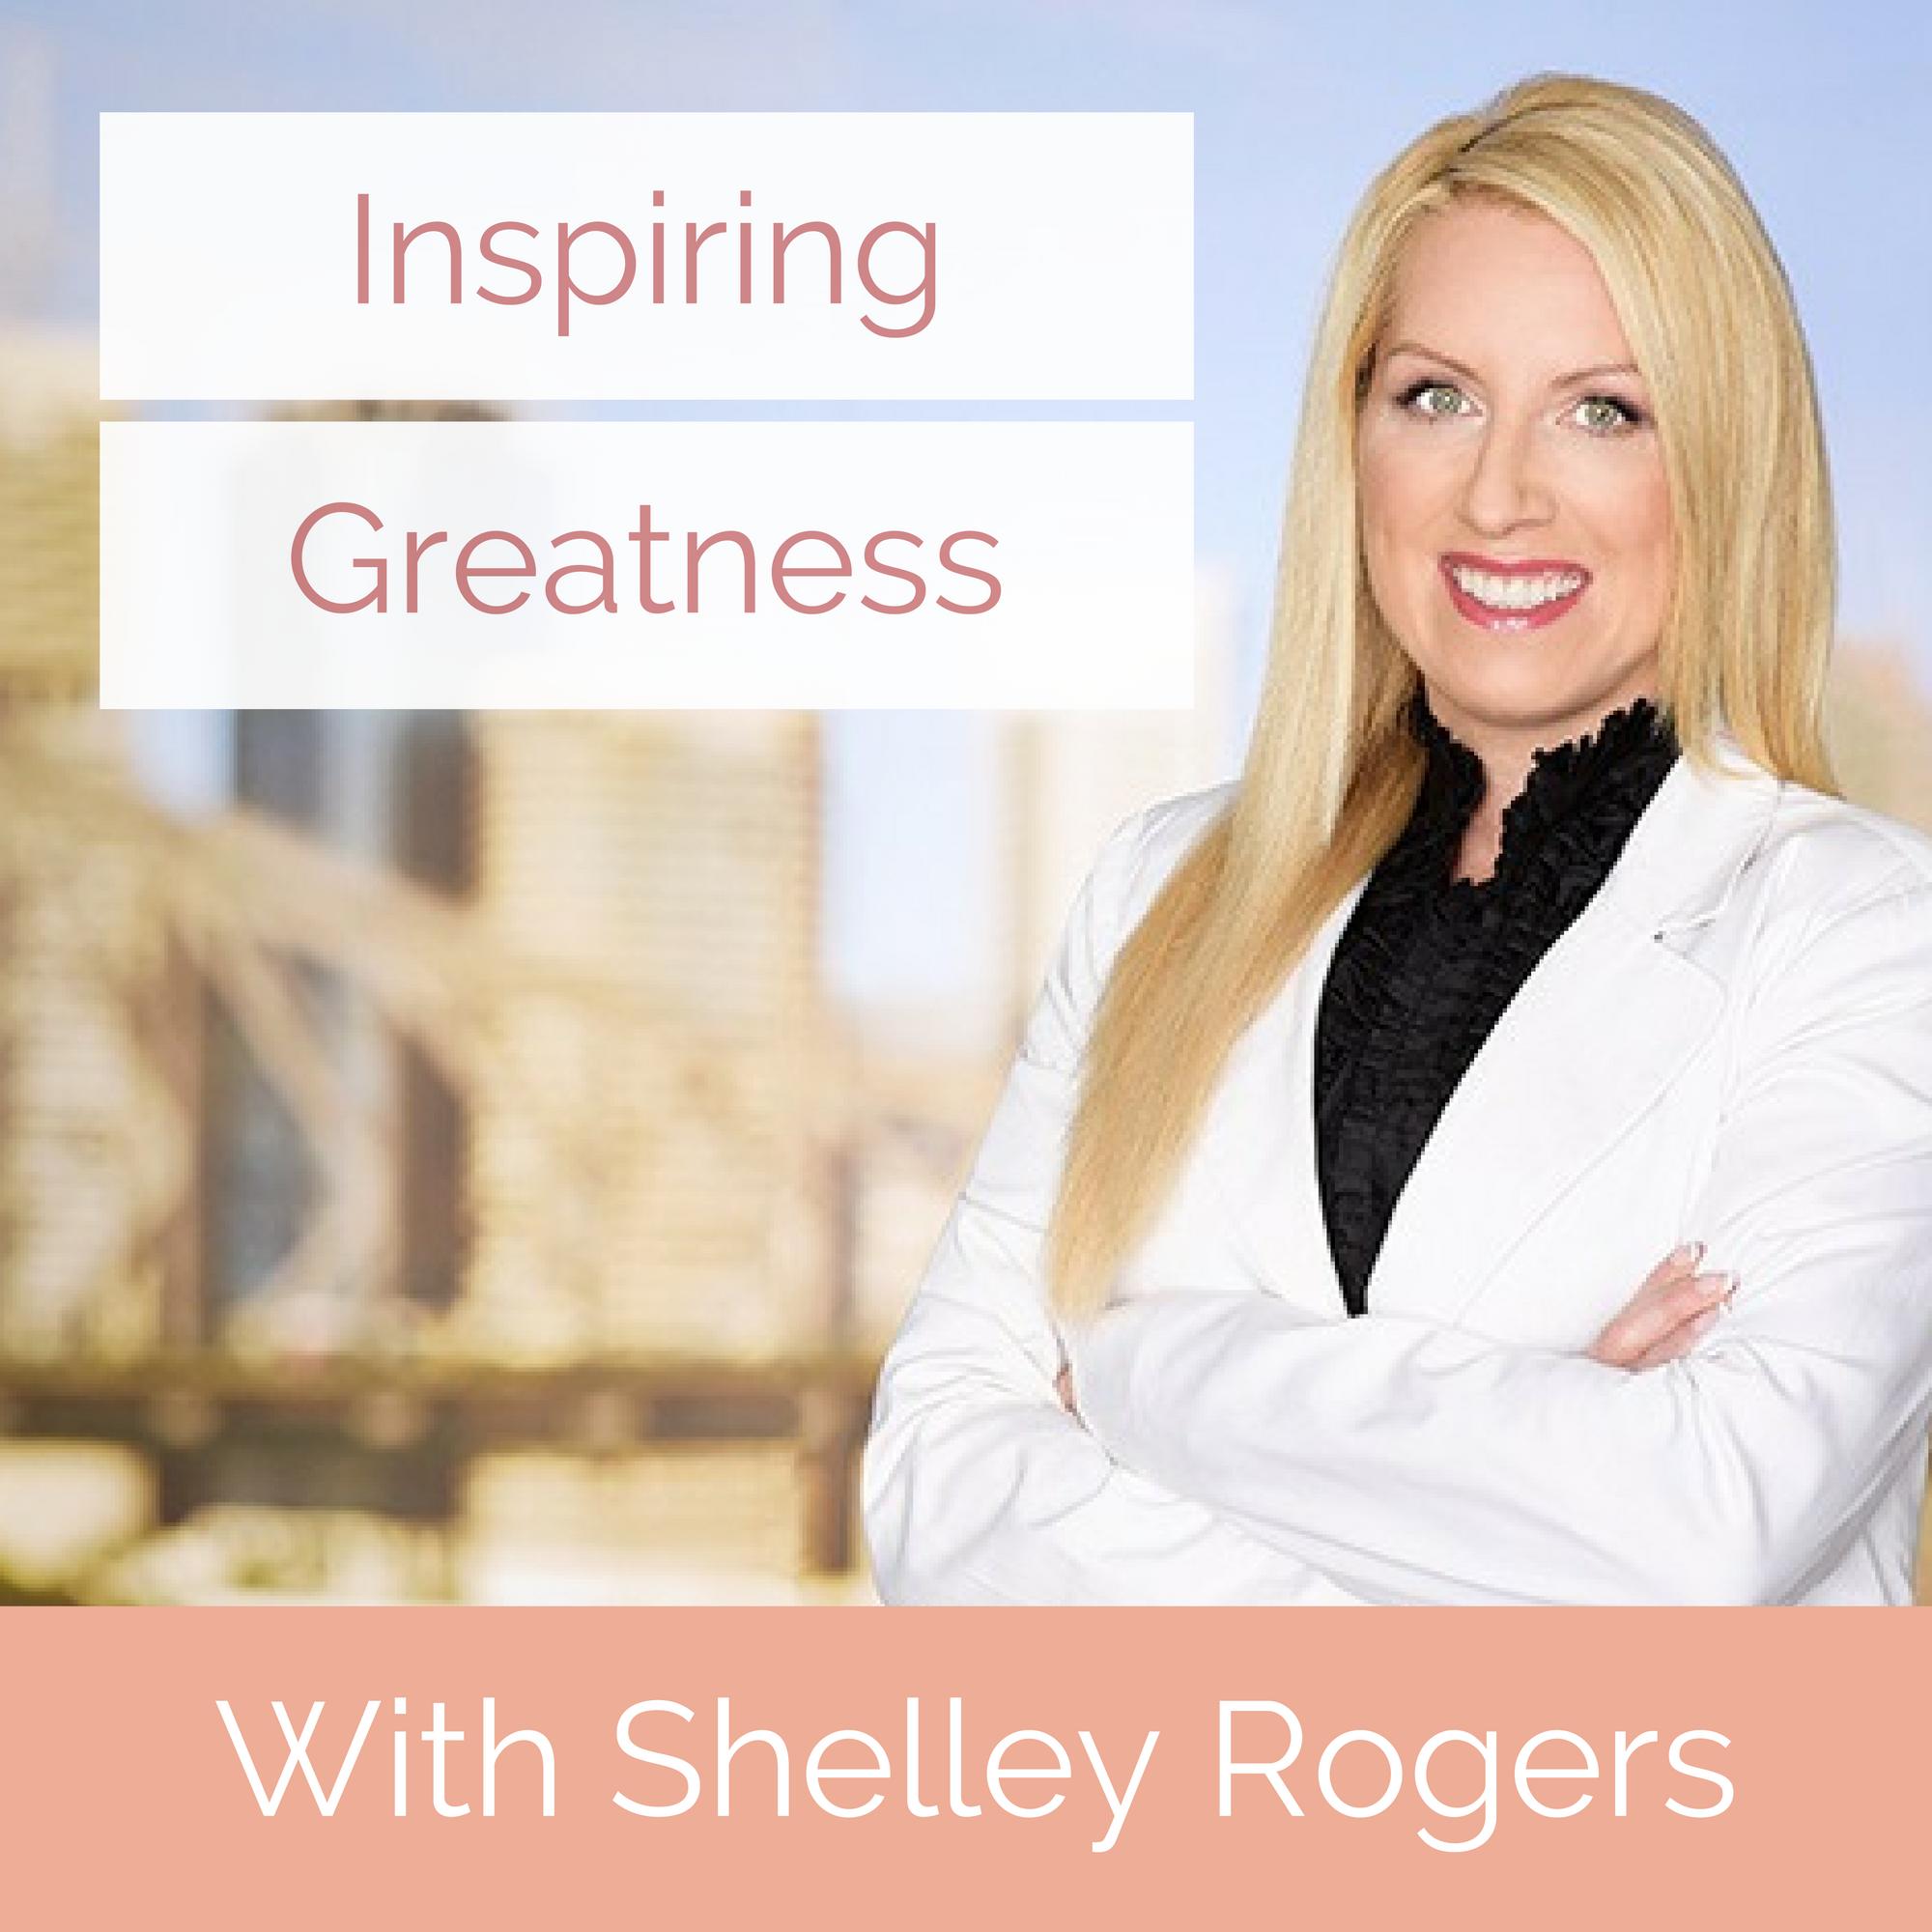 Inspiring-Greatness-3